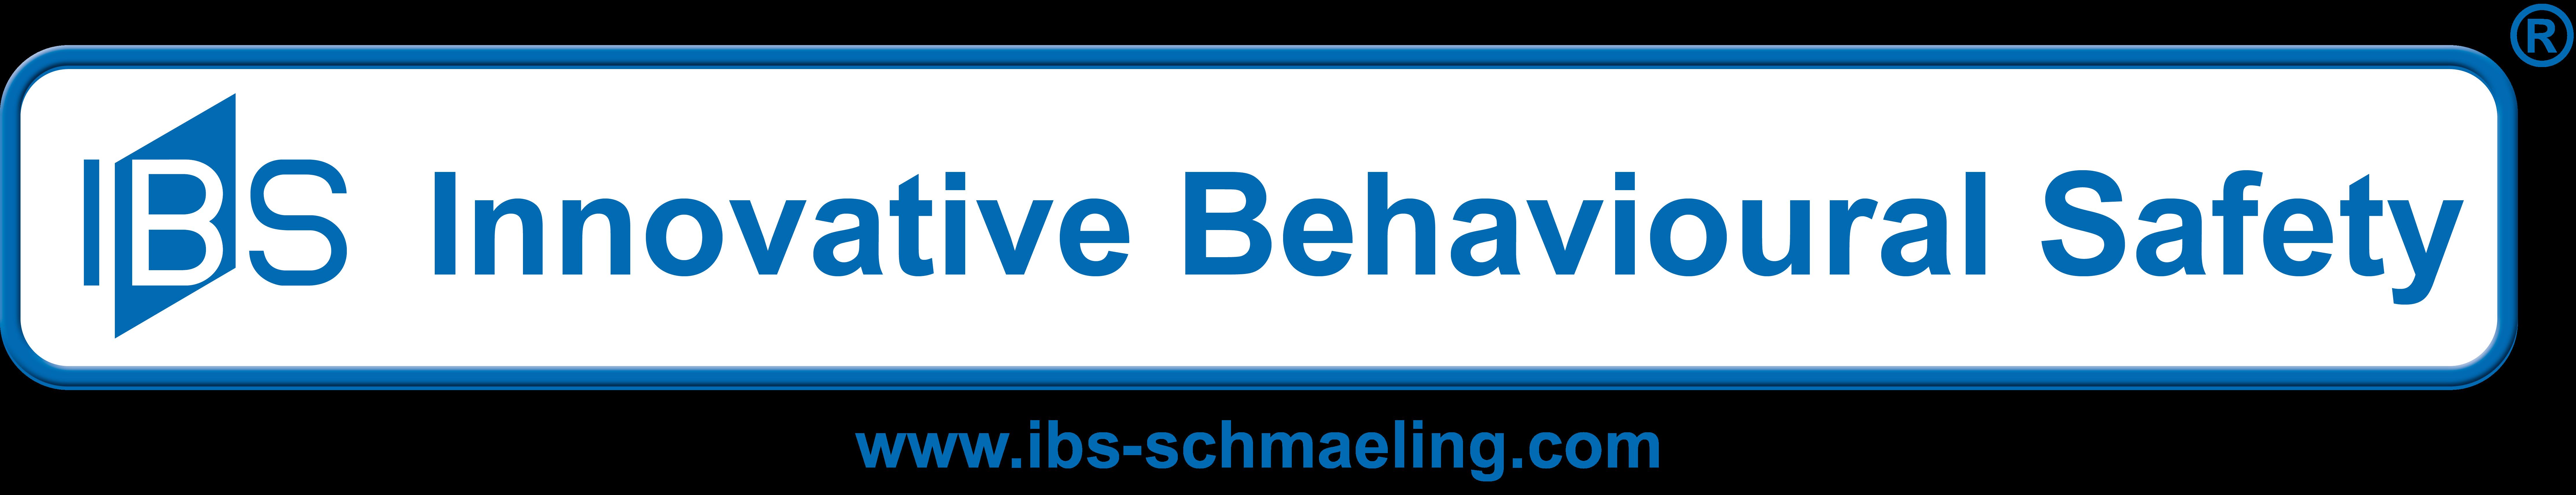 innovative-behavioural-safety-www.-2020